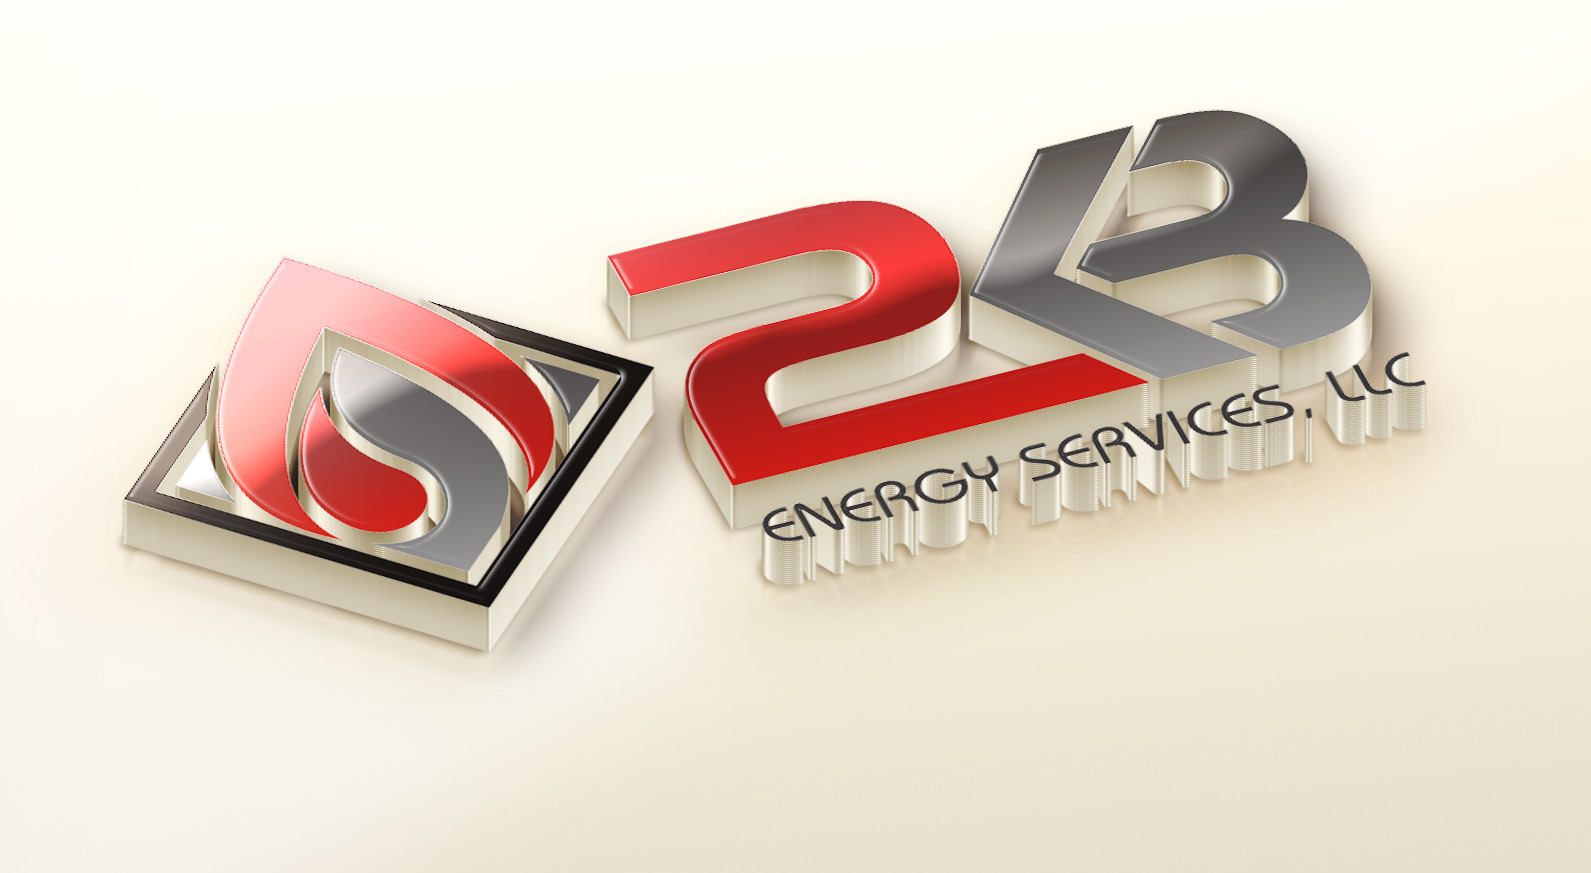 Logo Design by Qul-qul Kikuk - Entry No. 48 in the Logo Design Contest Creative Logo Design for 2KB Energy Services, LLC.